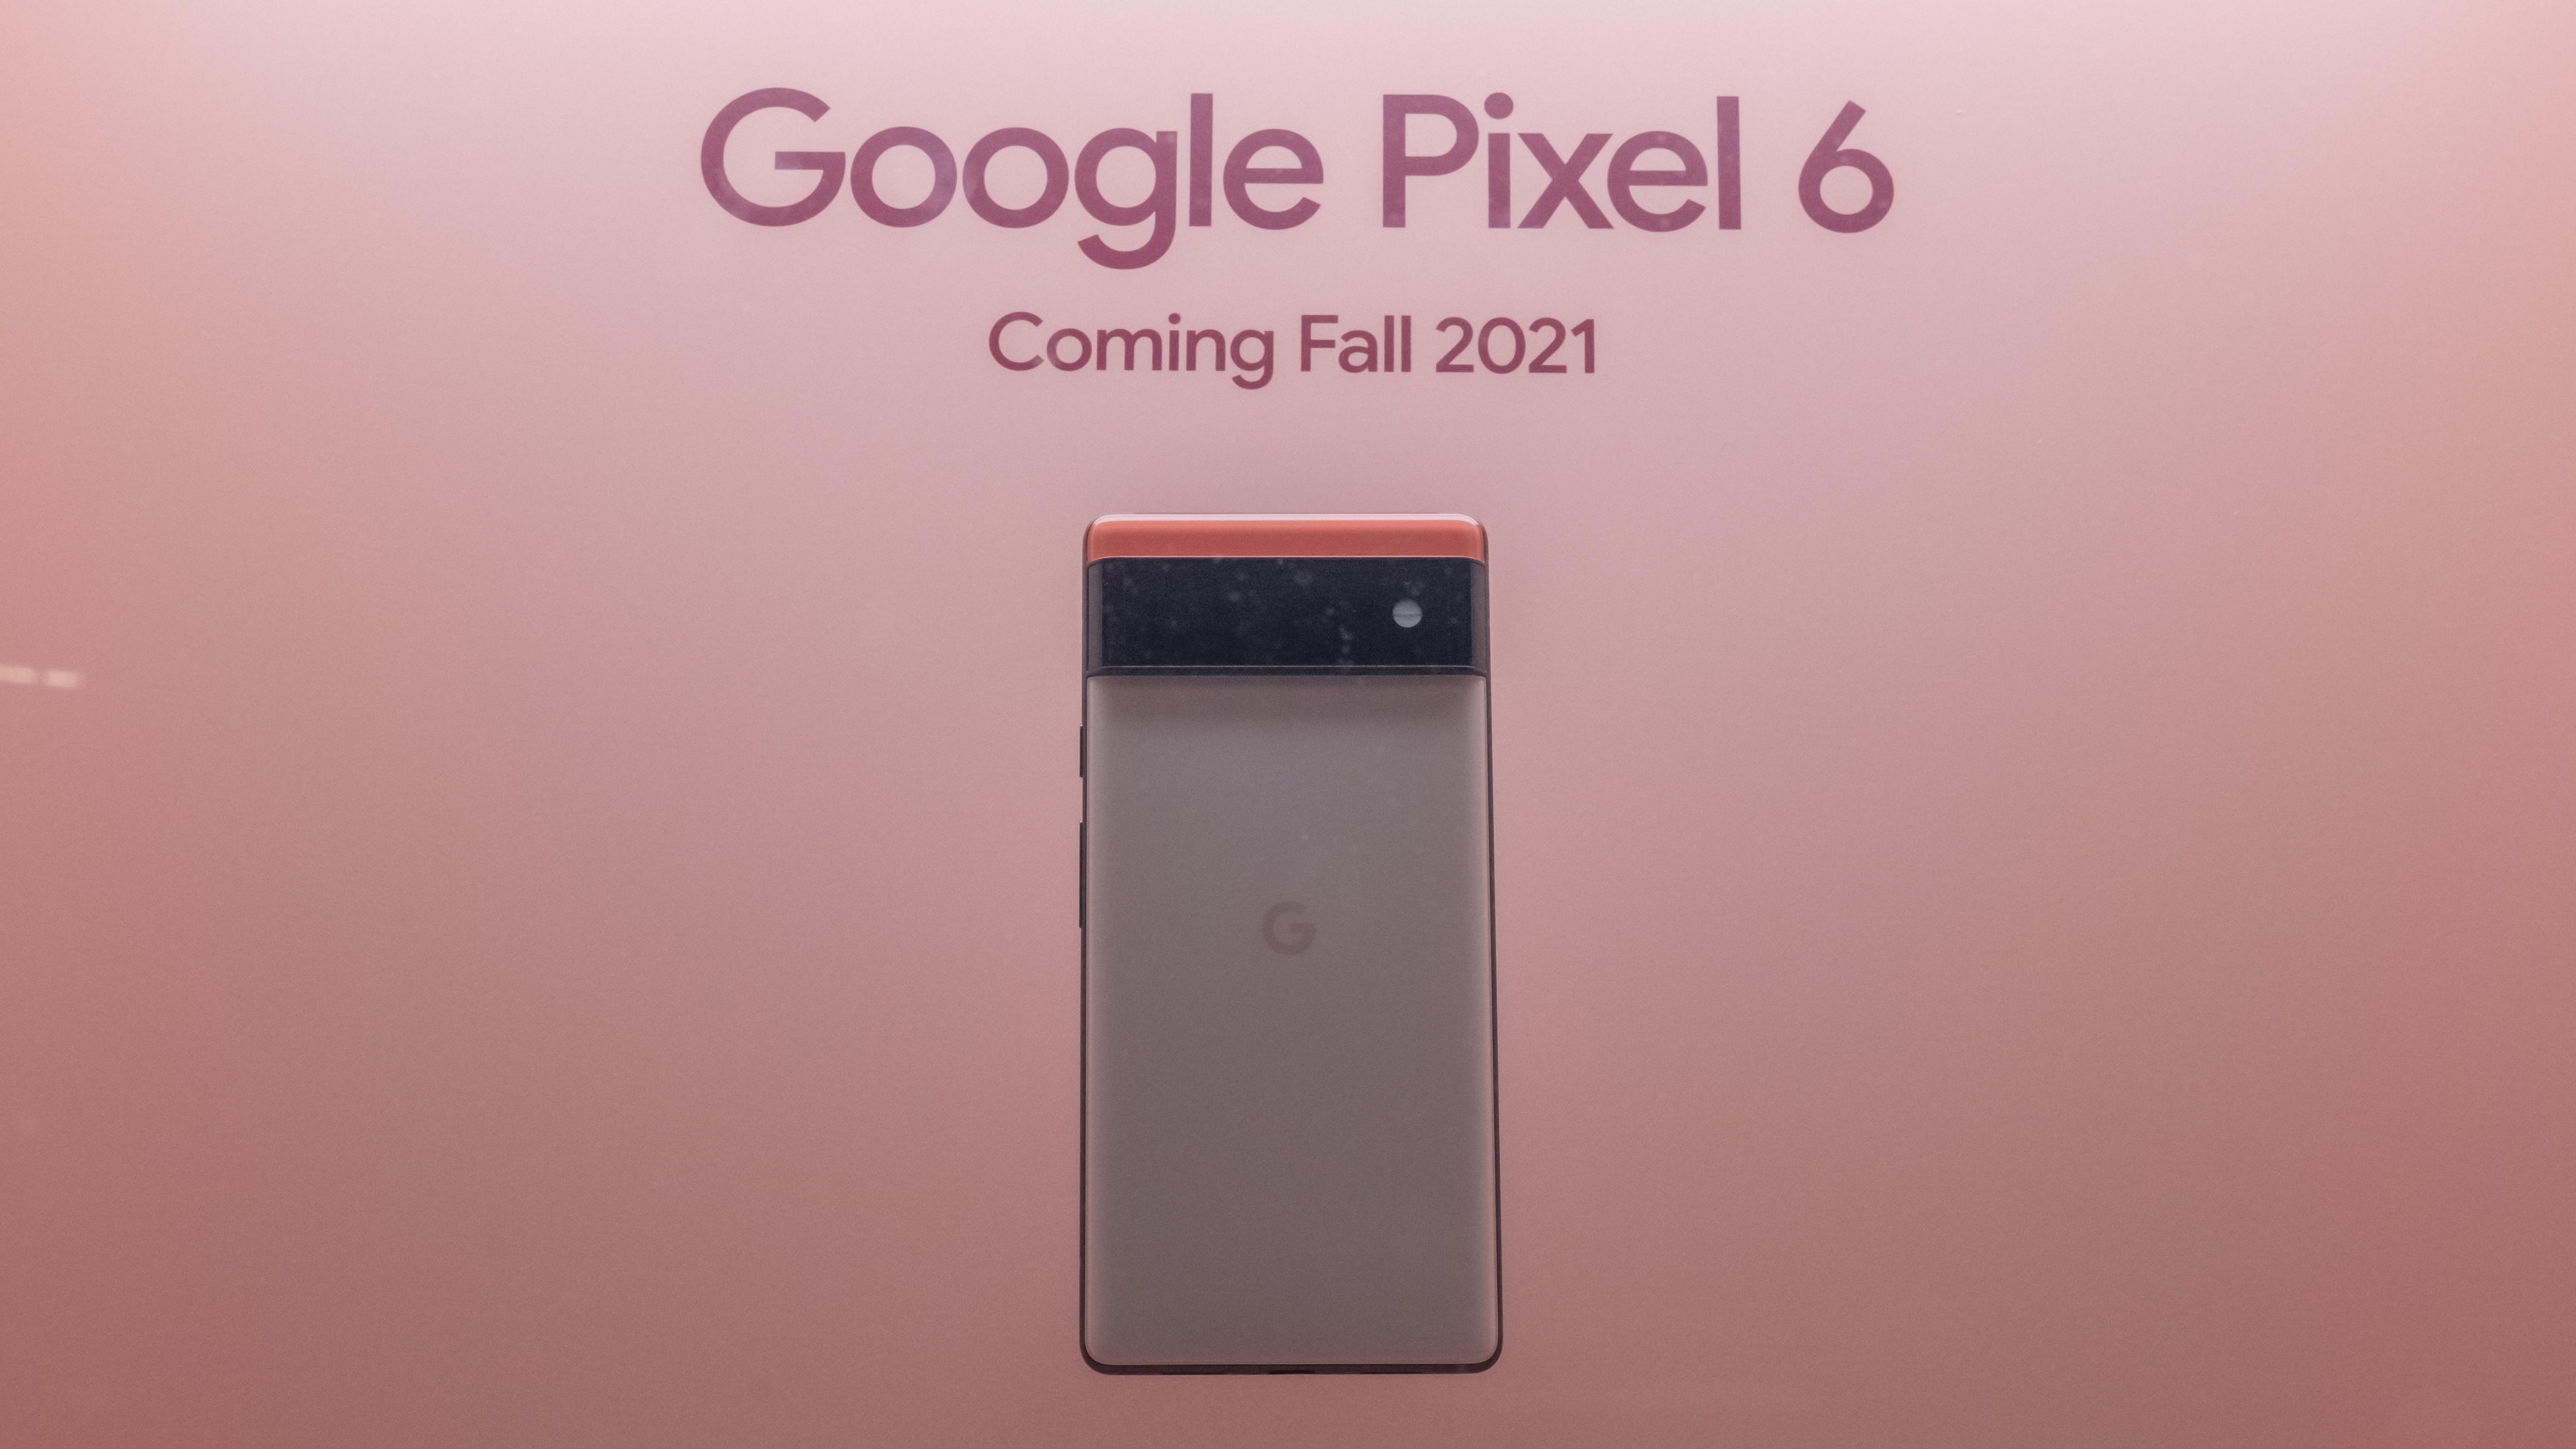 Google Pixel 6 phones on display